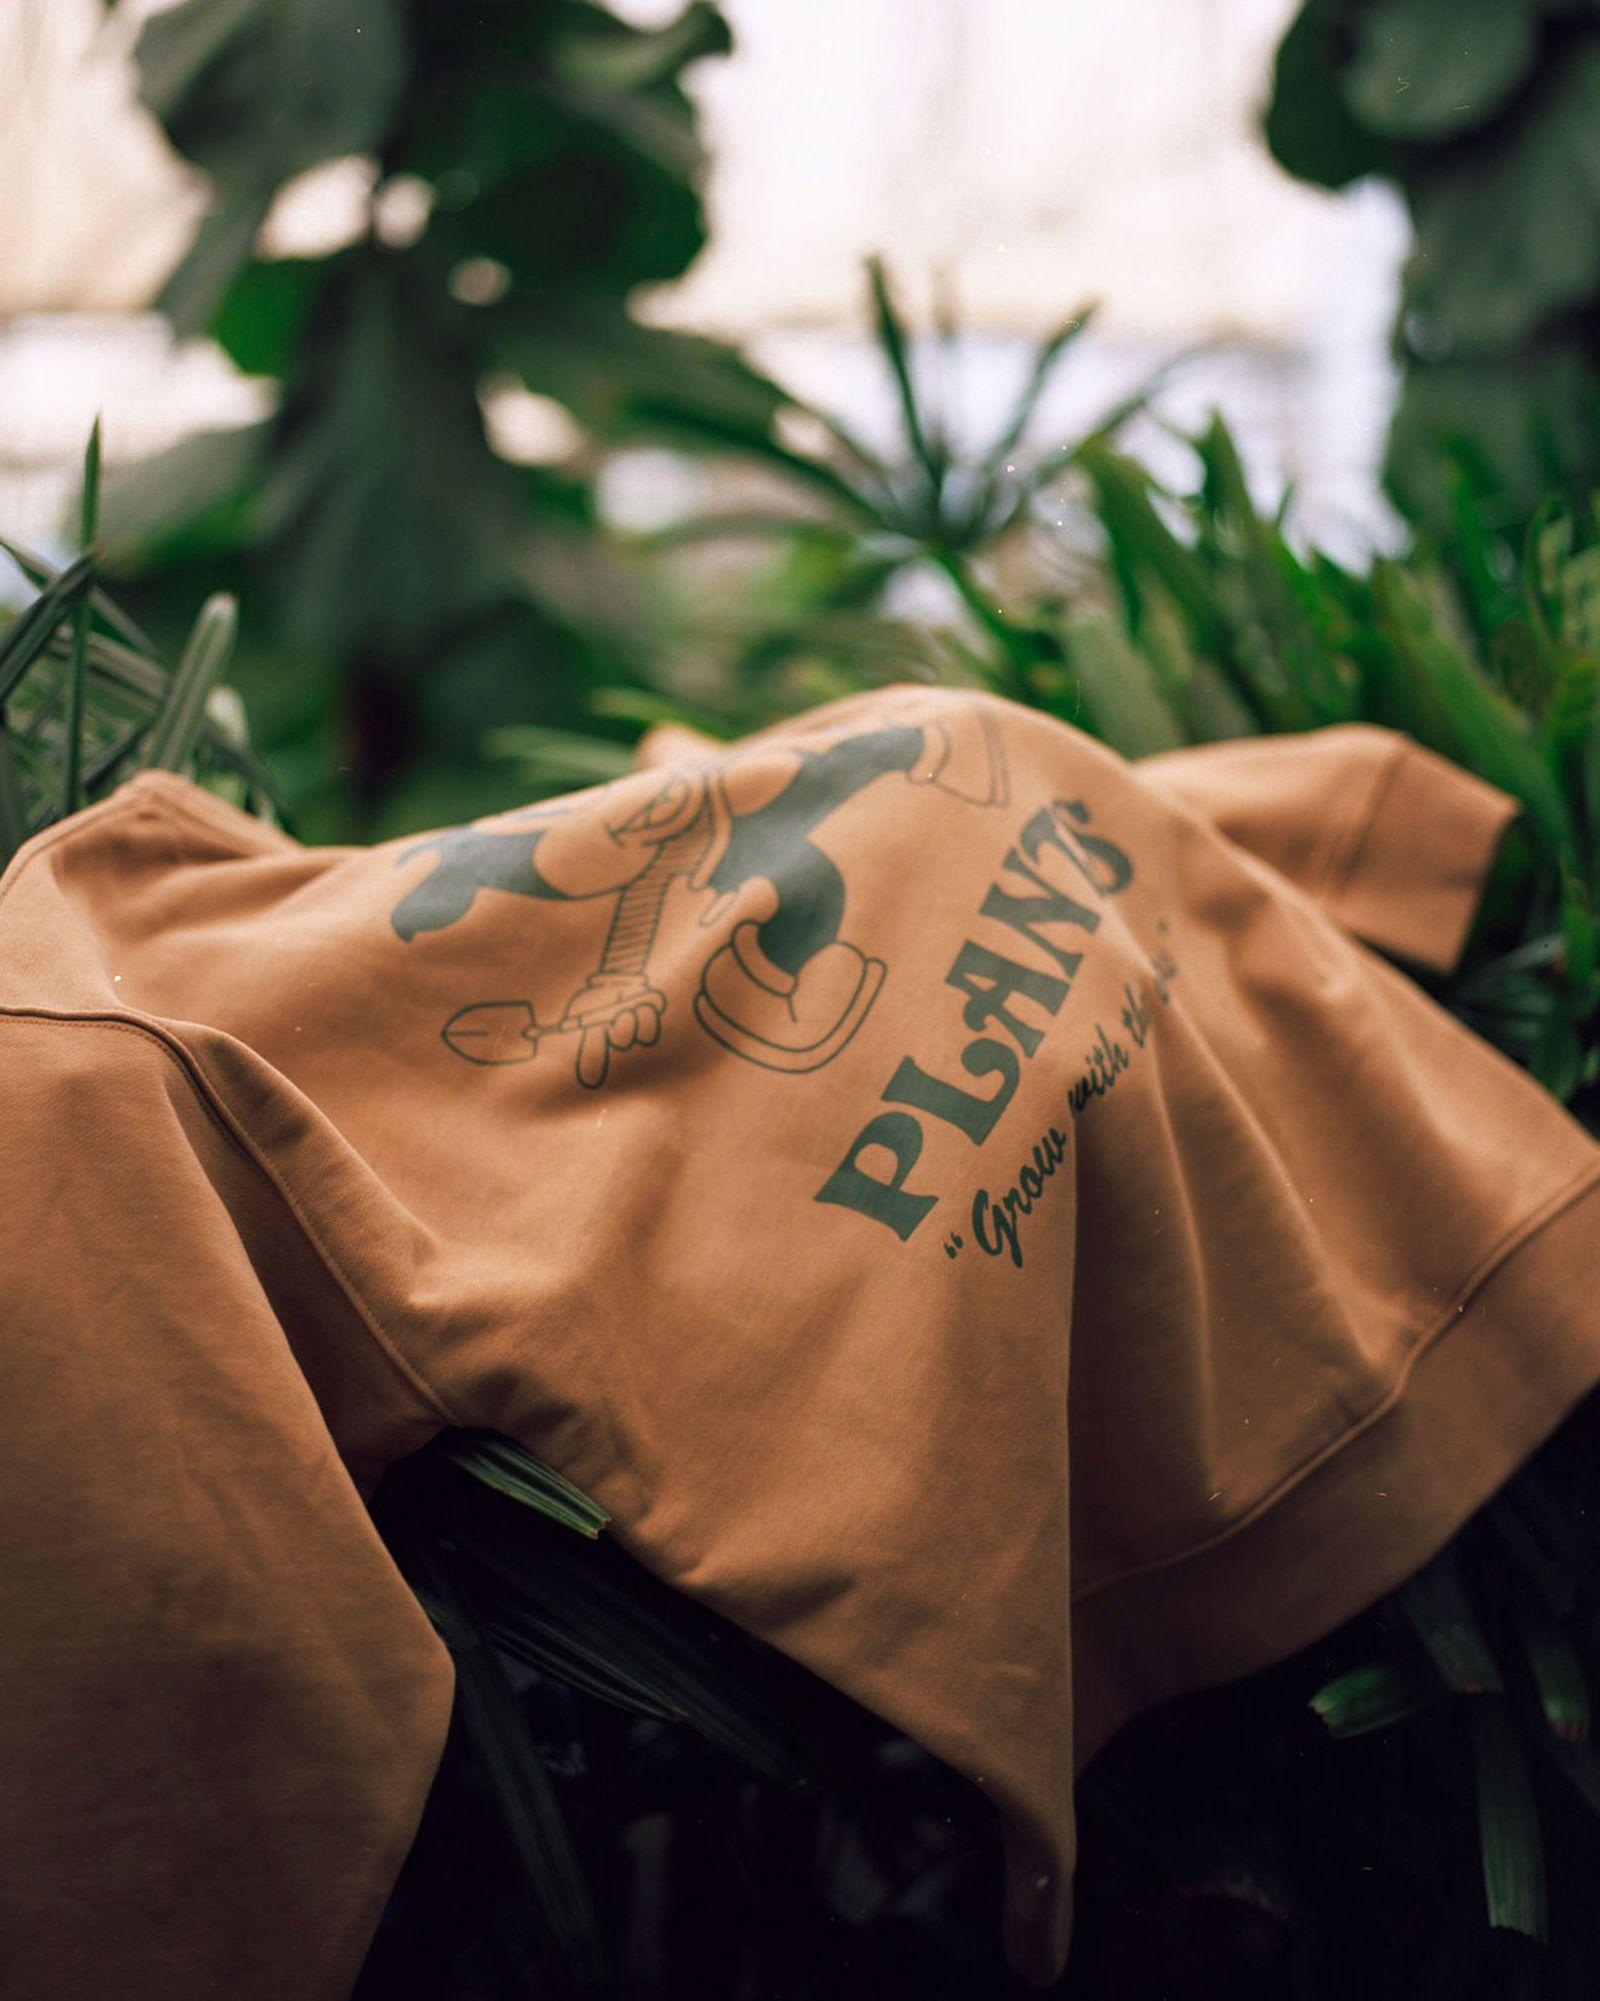 plant-man-p-hm-blank-staples-new-06